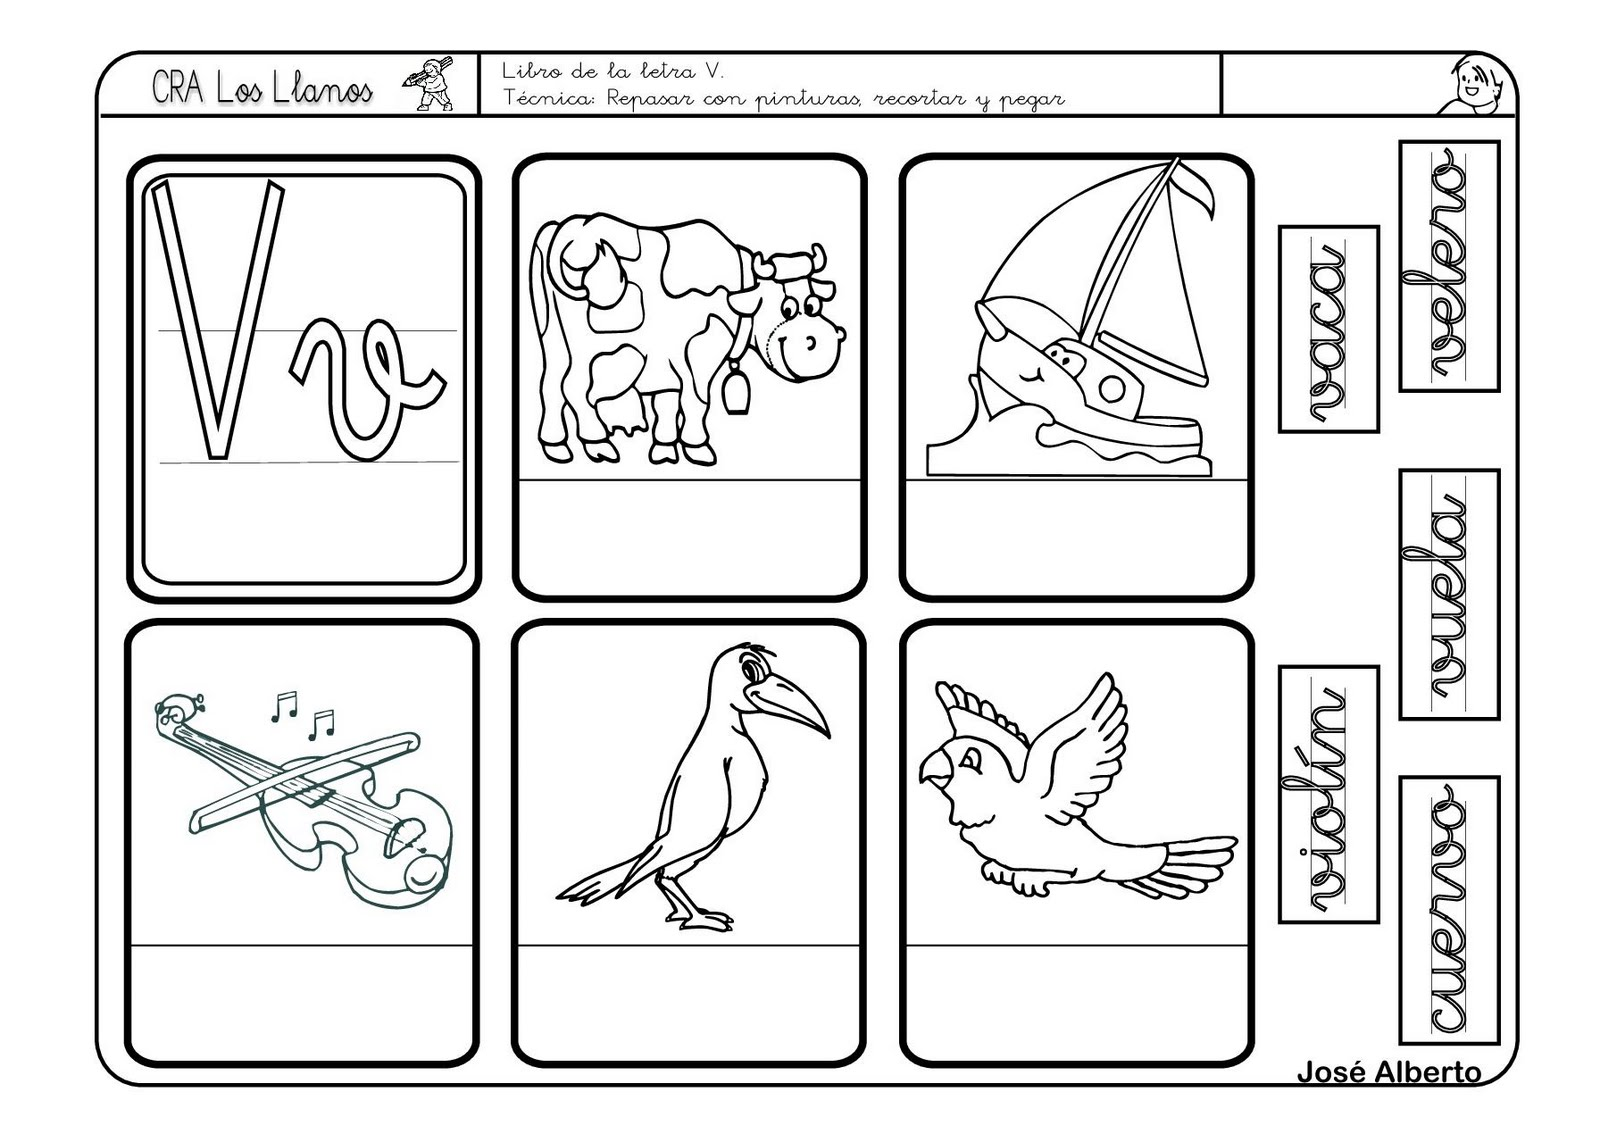 Encantador Letra V Para Colorear Para Imprimir Elaboración - Dibujos ...